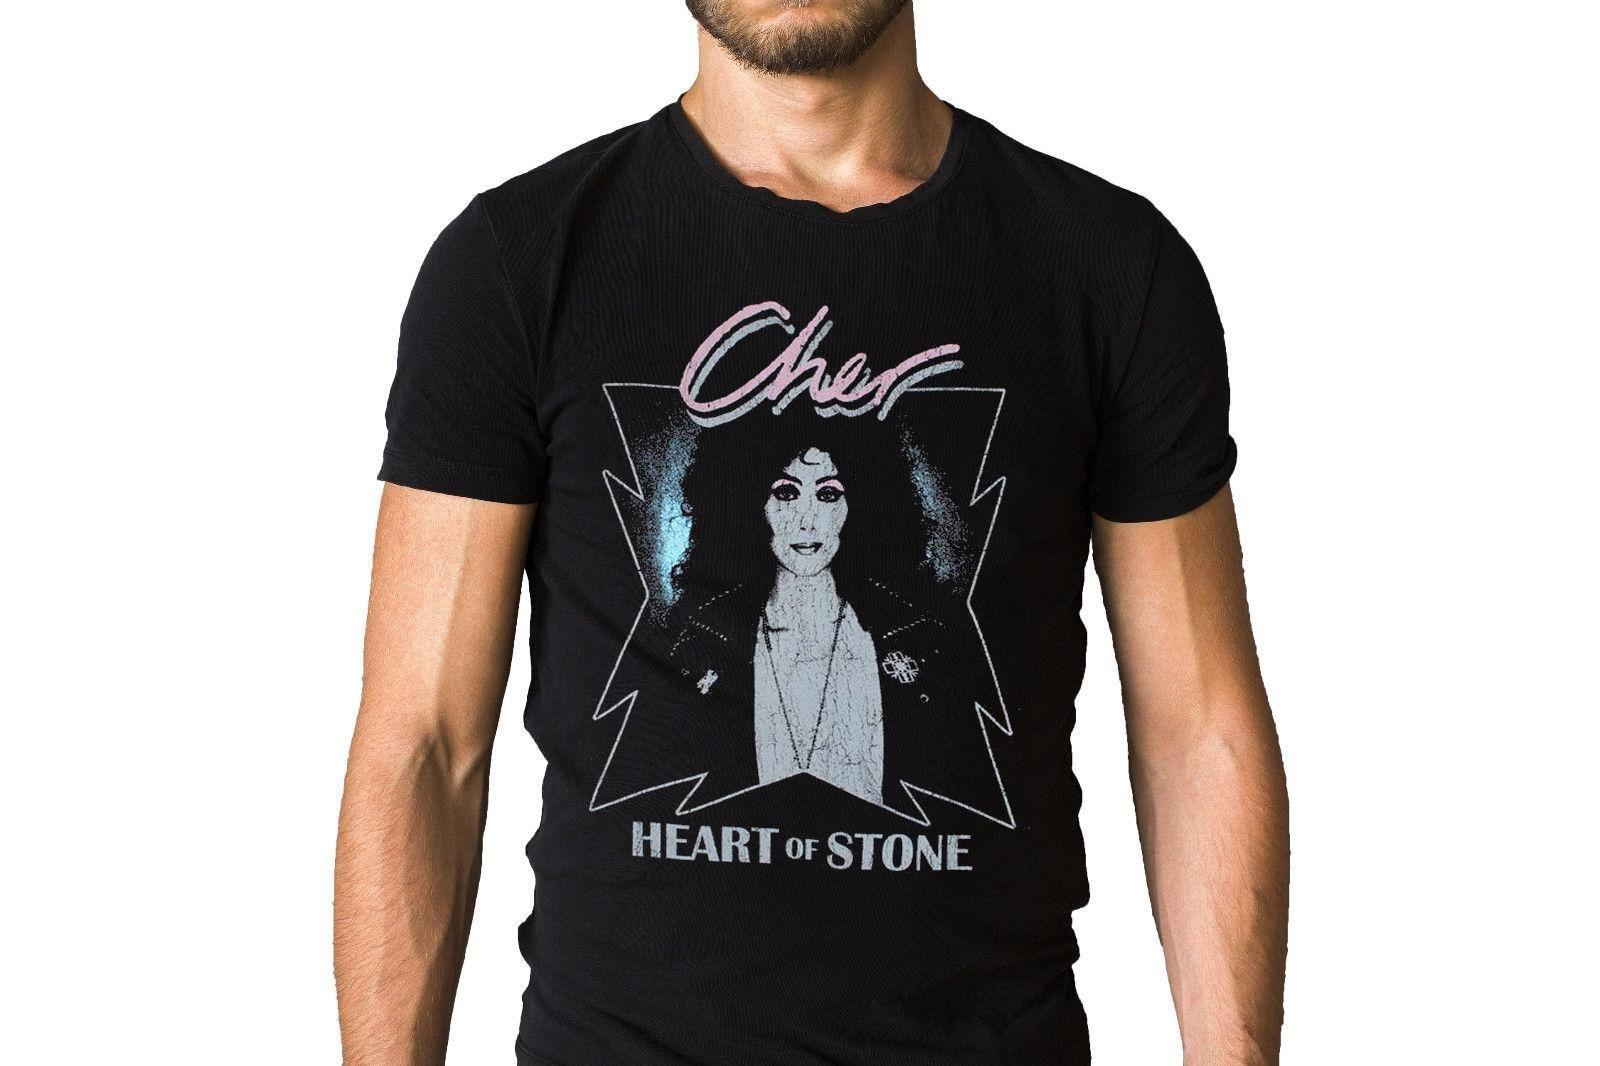 3a1ea390 Cher Heart Of Stone T Shirt High Quality Custom Printed Tops Hipster Tees T  Shirt T Shirt On Buy Cool Shirts From Shitan2, $11.78| DHgate.Com